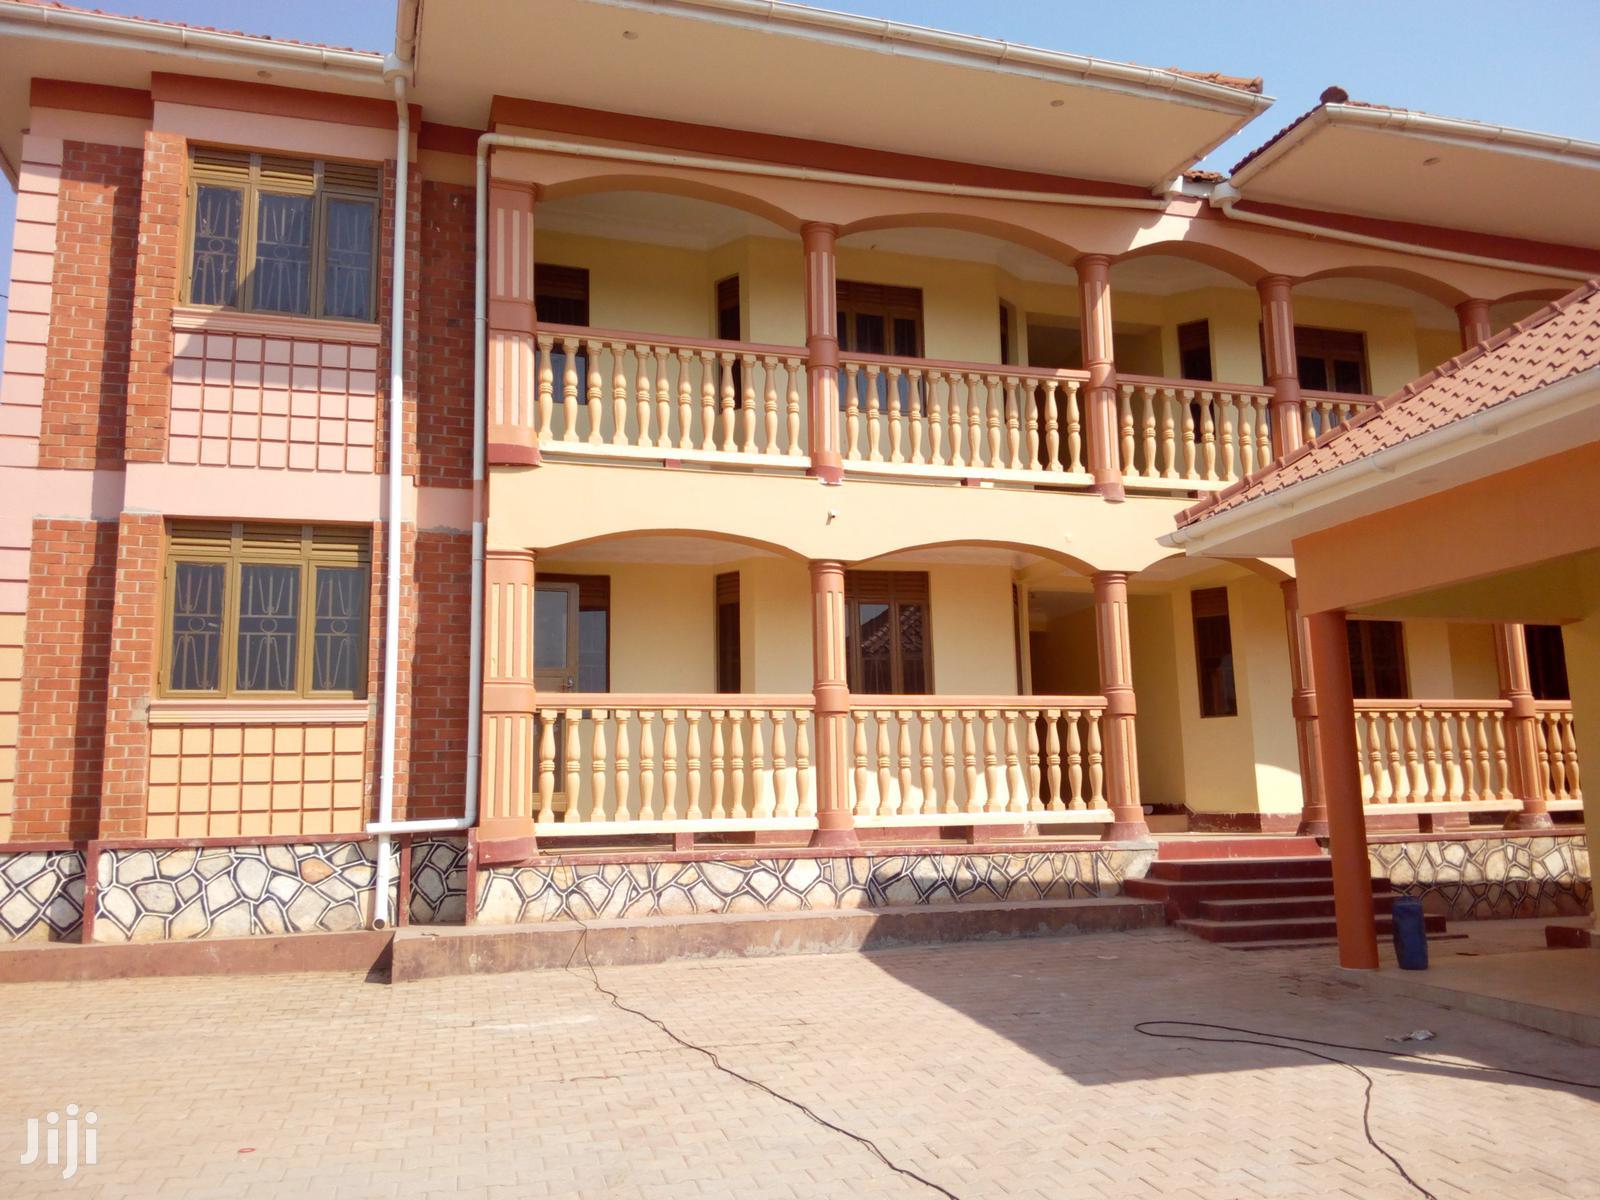 Kyaliwajjala Two Bedroom Apartment For Rent